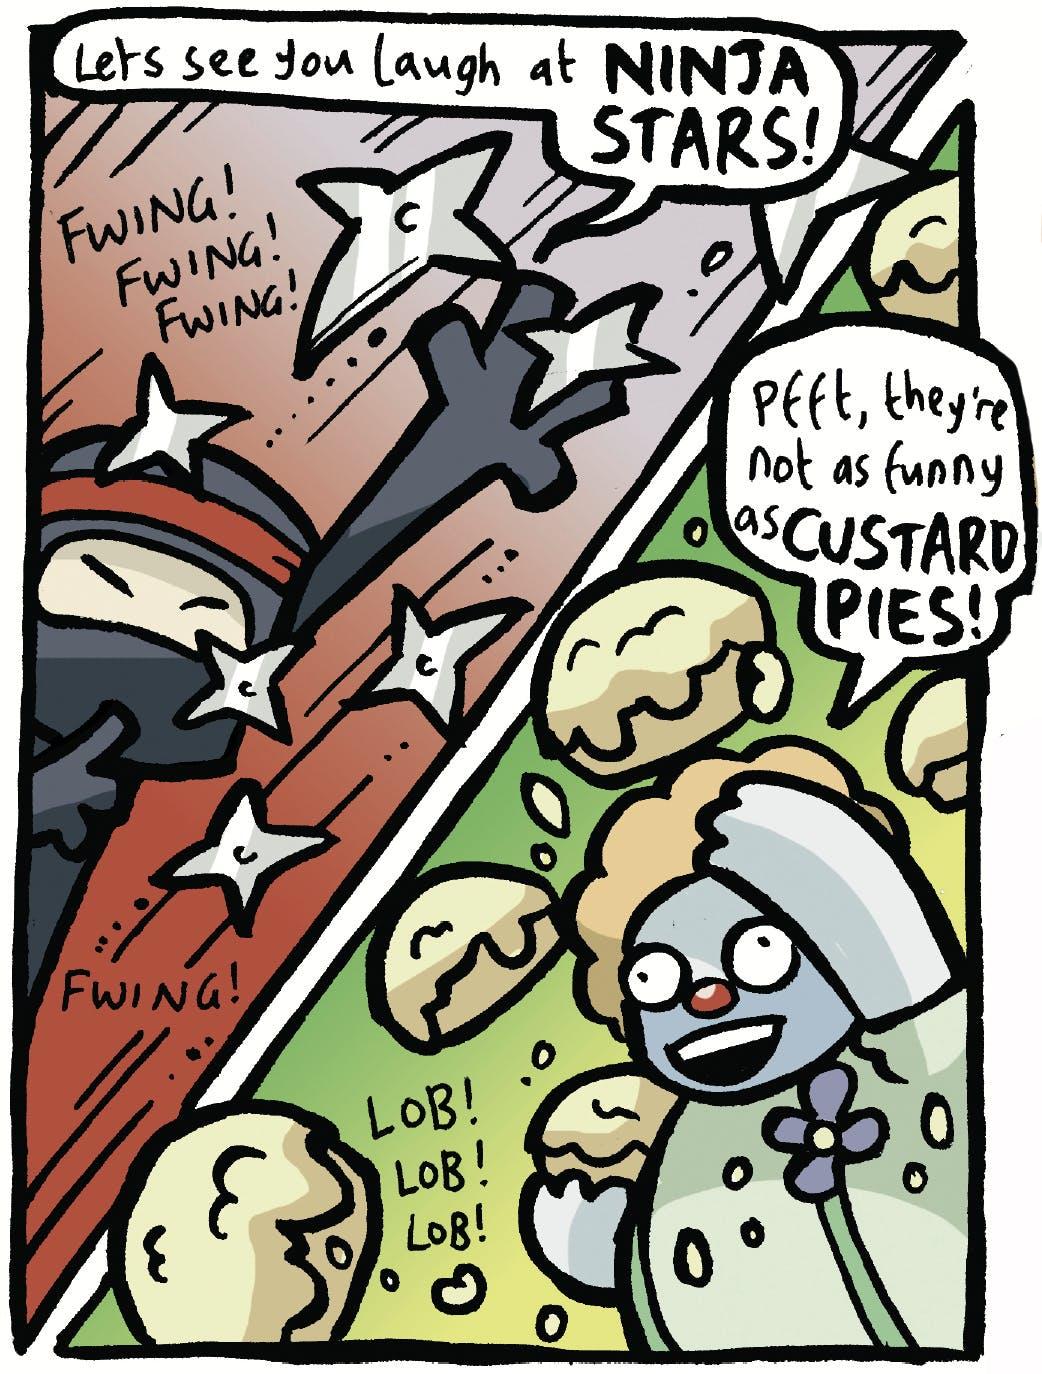 Arena of Awesome - Ninja vs. Clown, Beano, Jamie Smart